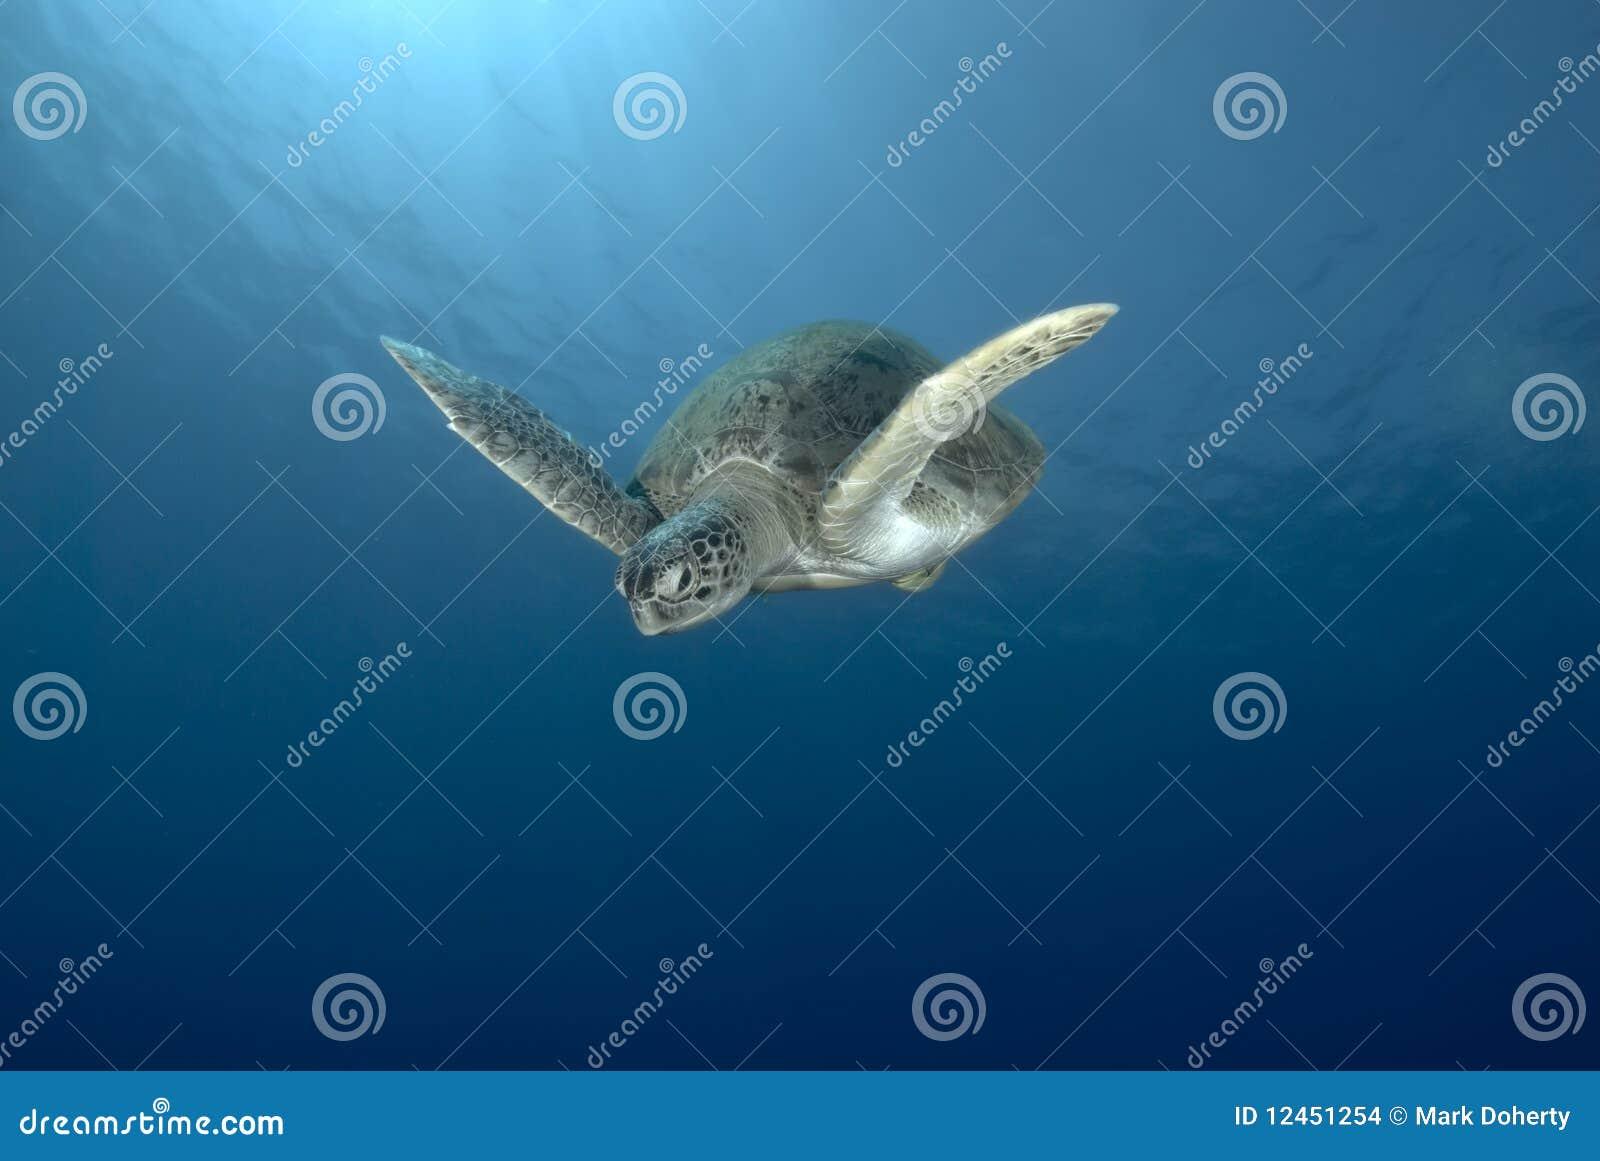 черепаха заплывания зеленого моря